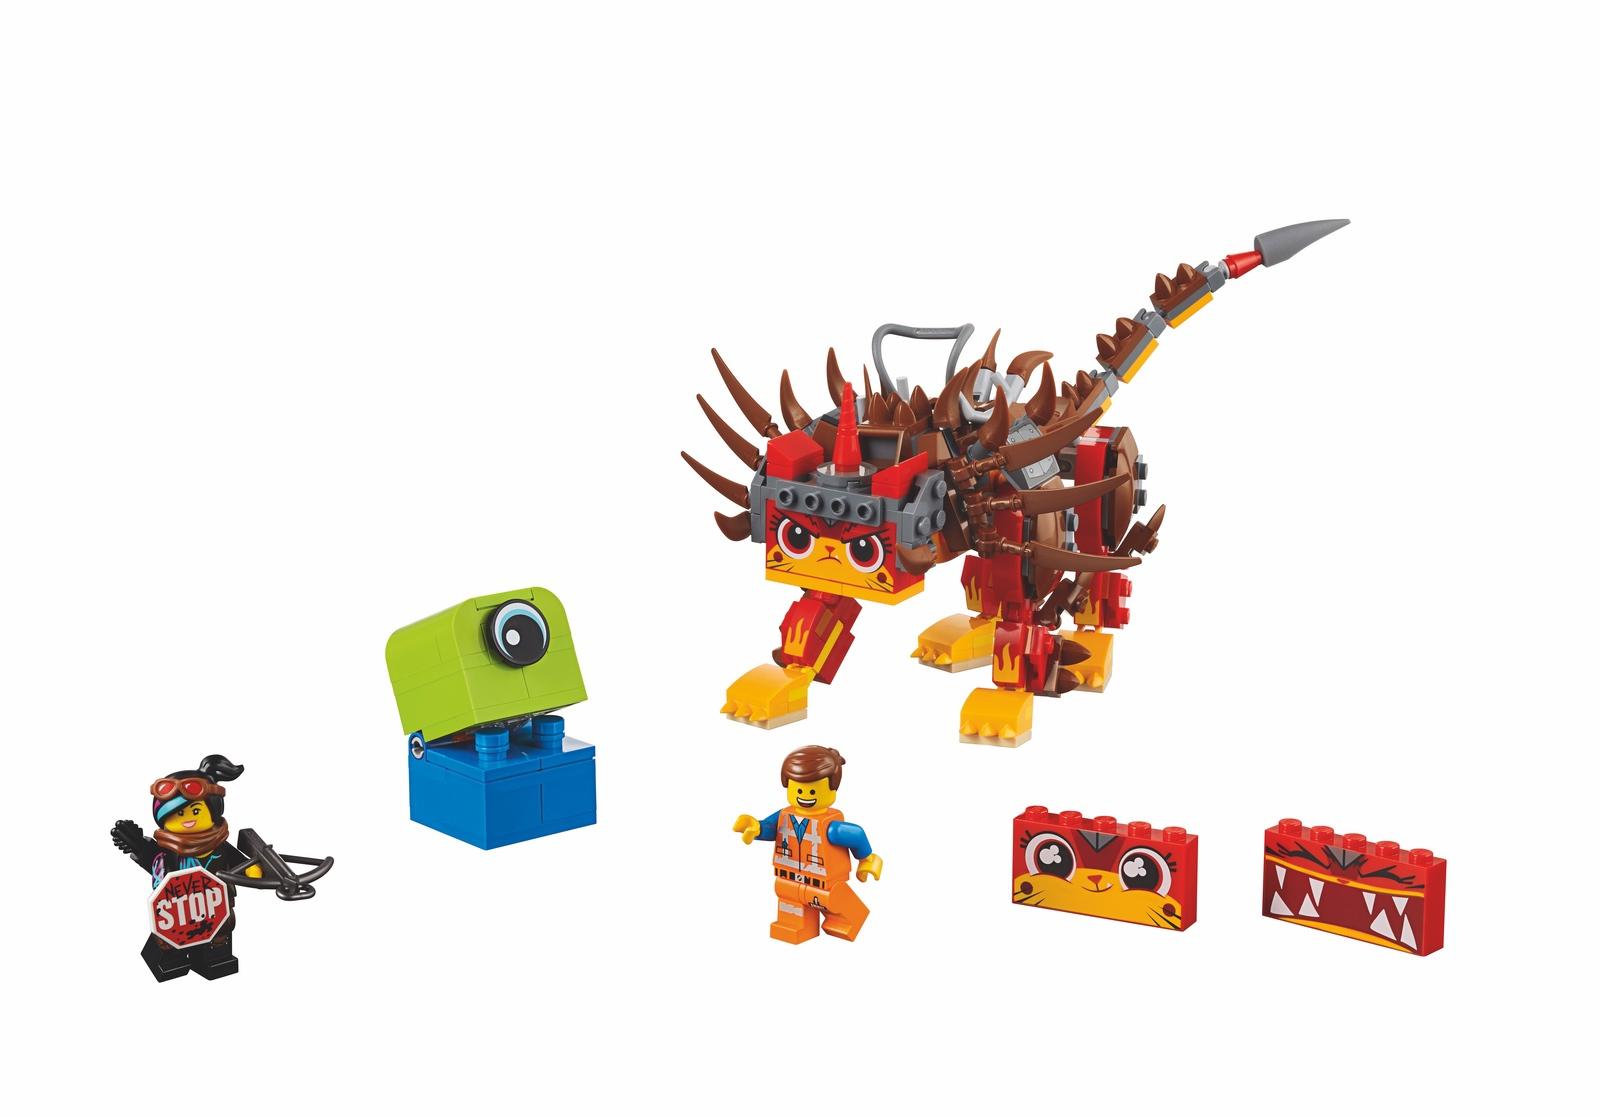 Lego Movie 2 Construction Sets Revealed Let The Building